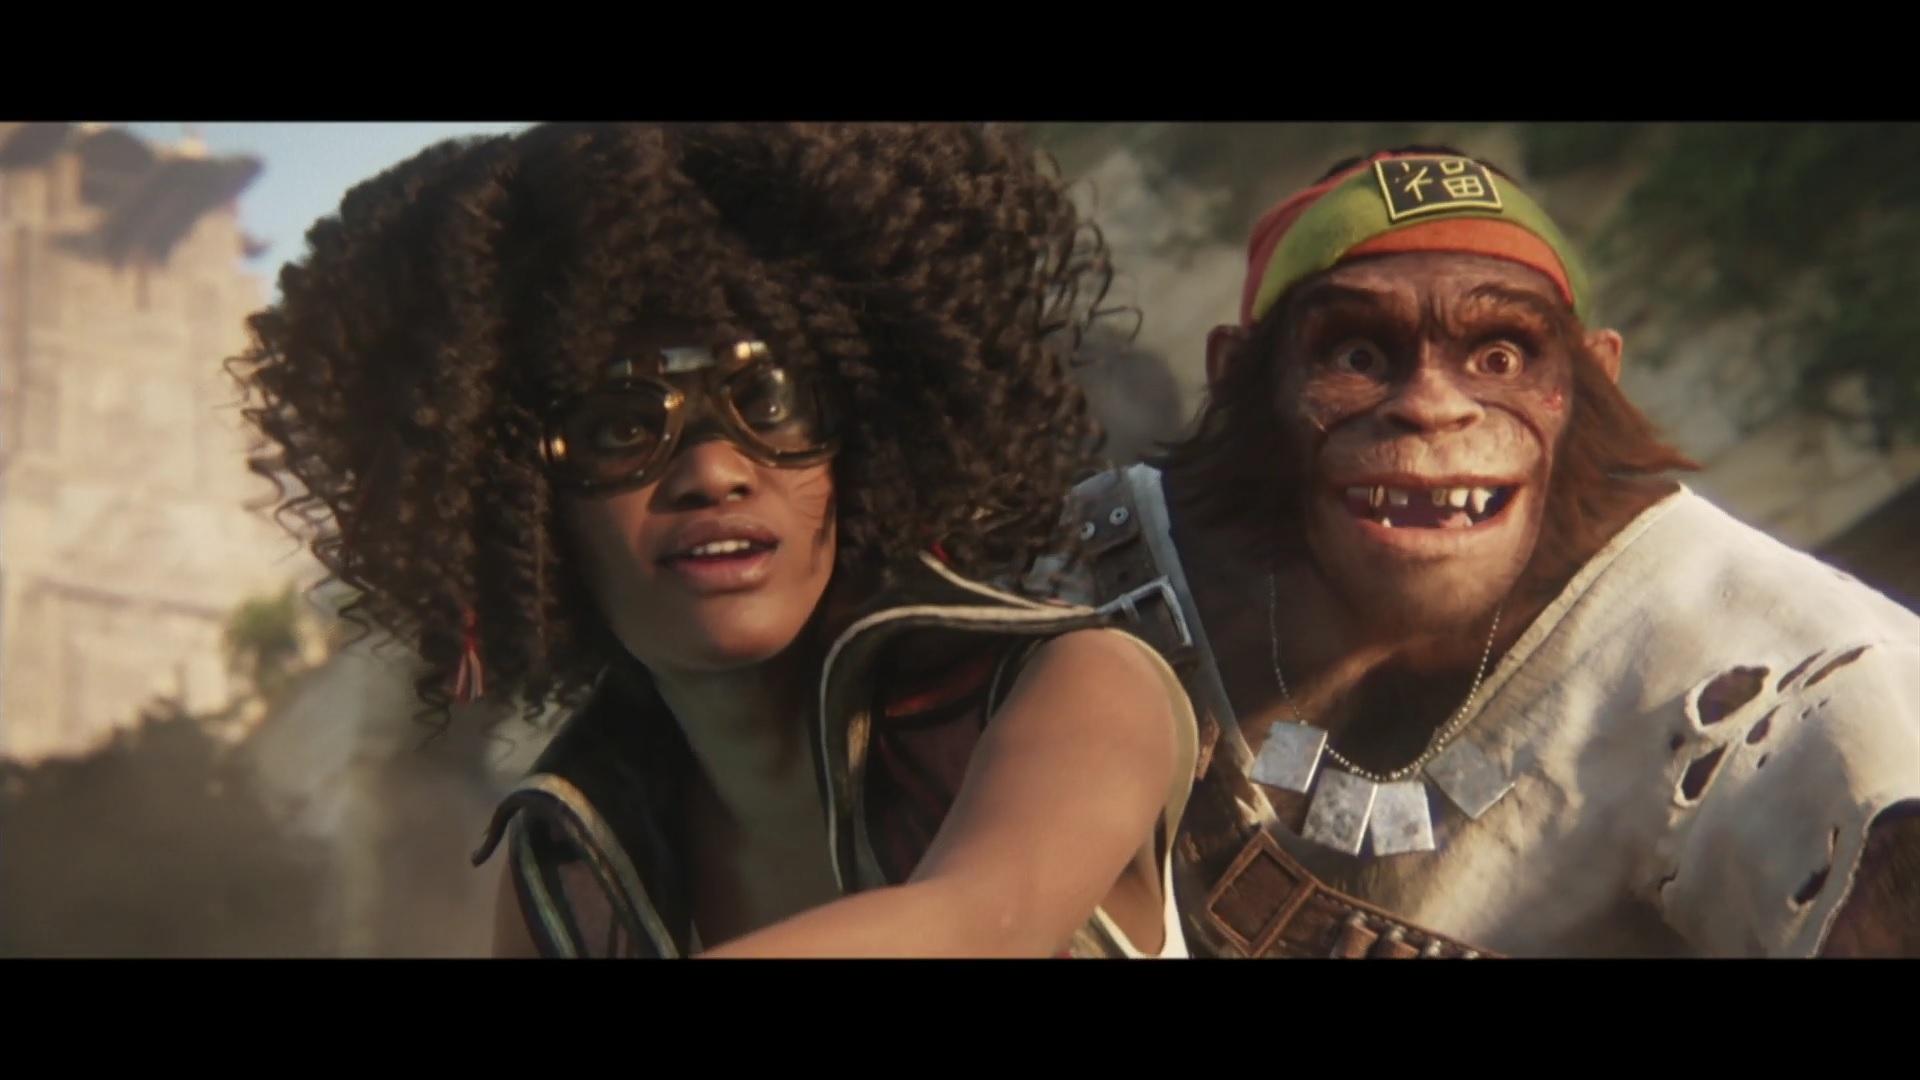 Photo of Ubisoft: Michel Ancel's Departure Won't Affect Beyond Good & Evil 2 [UPDATE]